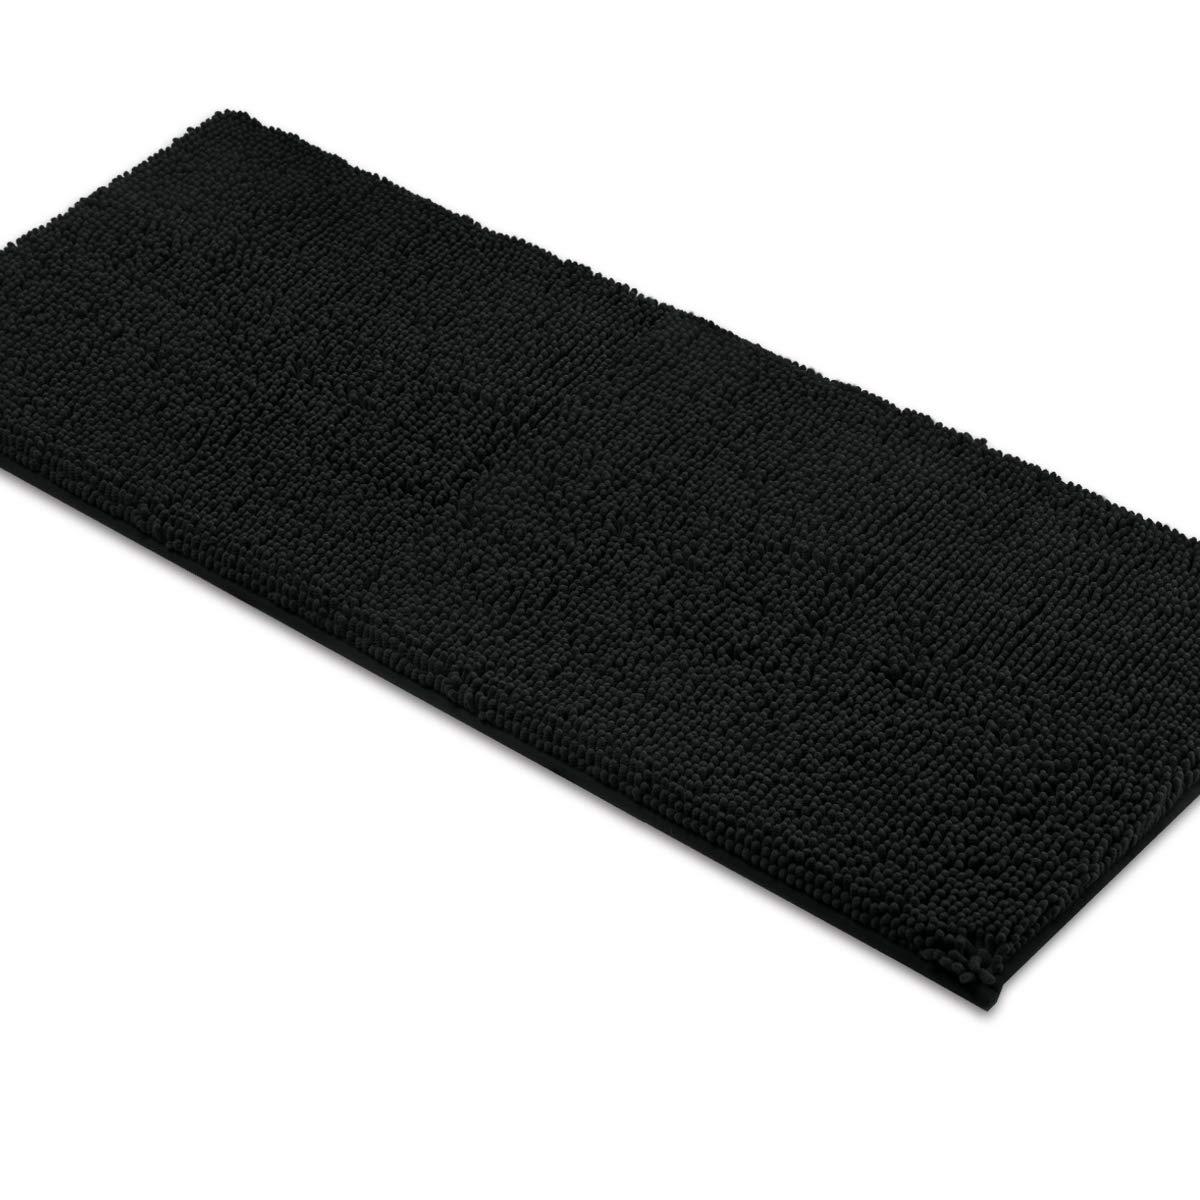 MAYSHINE Non-Slip Bathroom Rugs Shag Shower Mat Machine-Washable Bath mats Runner with Water Absorbent Soft Microfibers - 27.5x47 inch Black MS170325